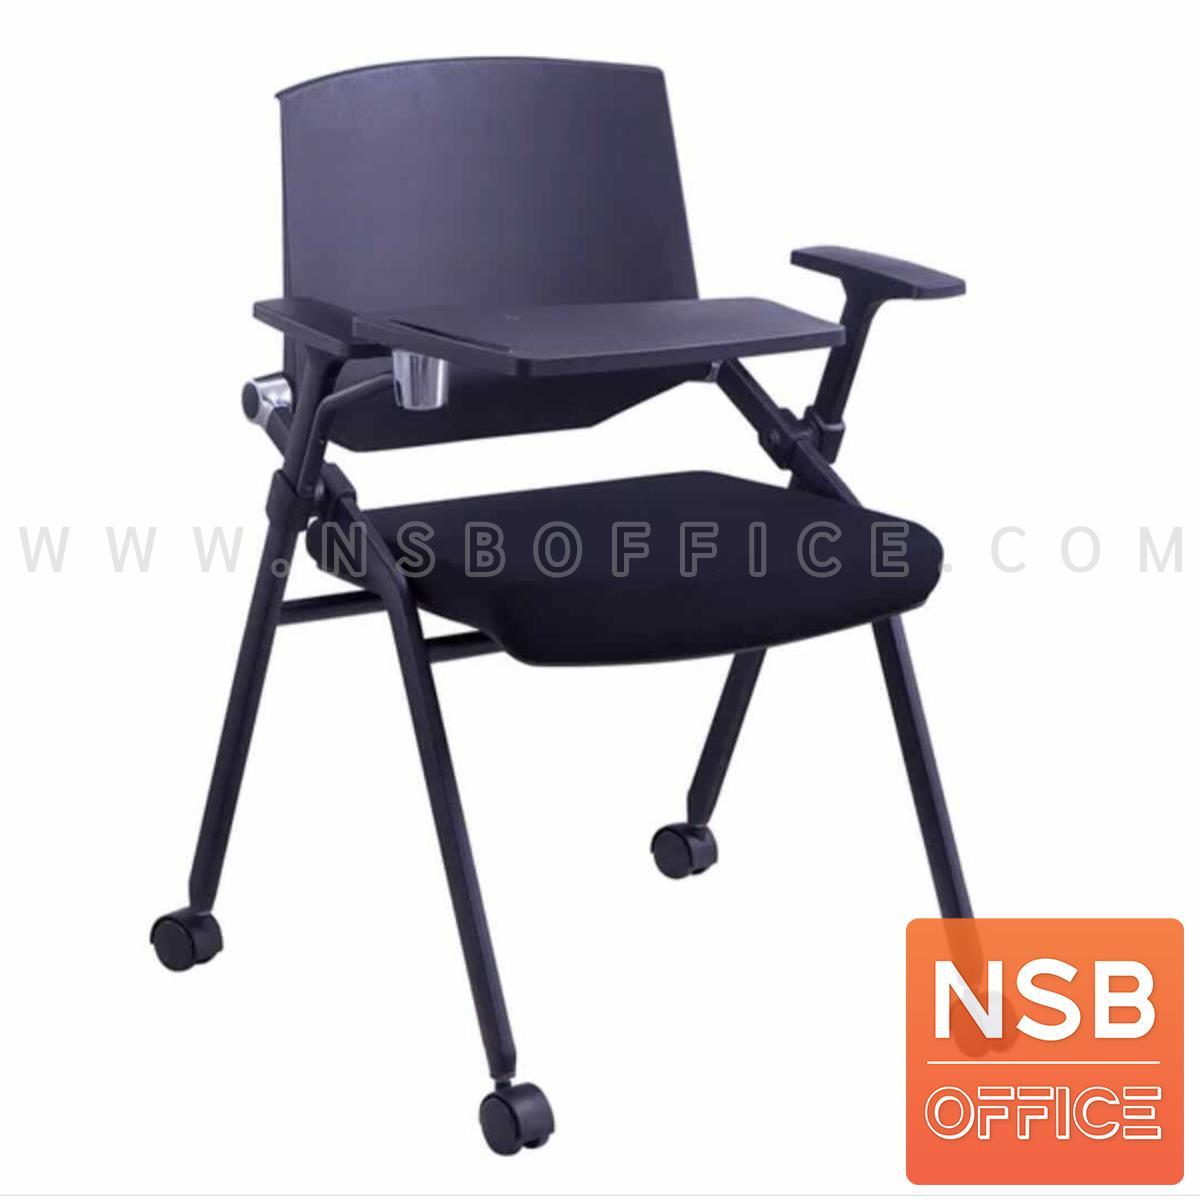 B07A099:เก้าอี้เลคเชอร์ รุ่น Adriana (อเดรียนา)   ขาเหล็กพ่นดำ ล้อเลื่อน